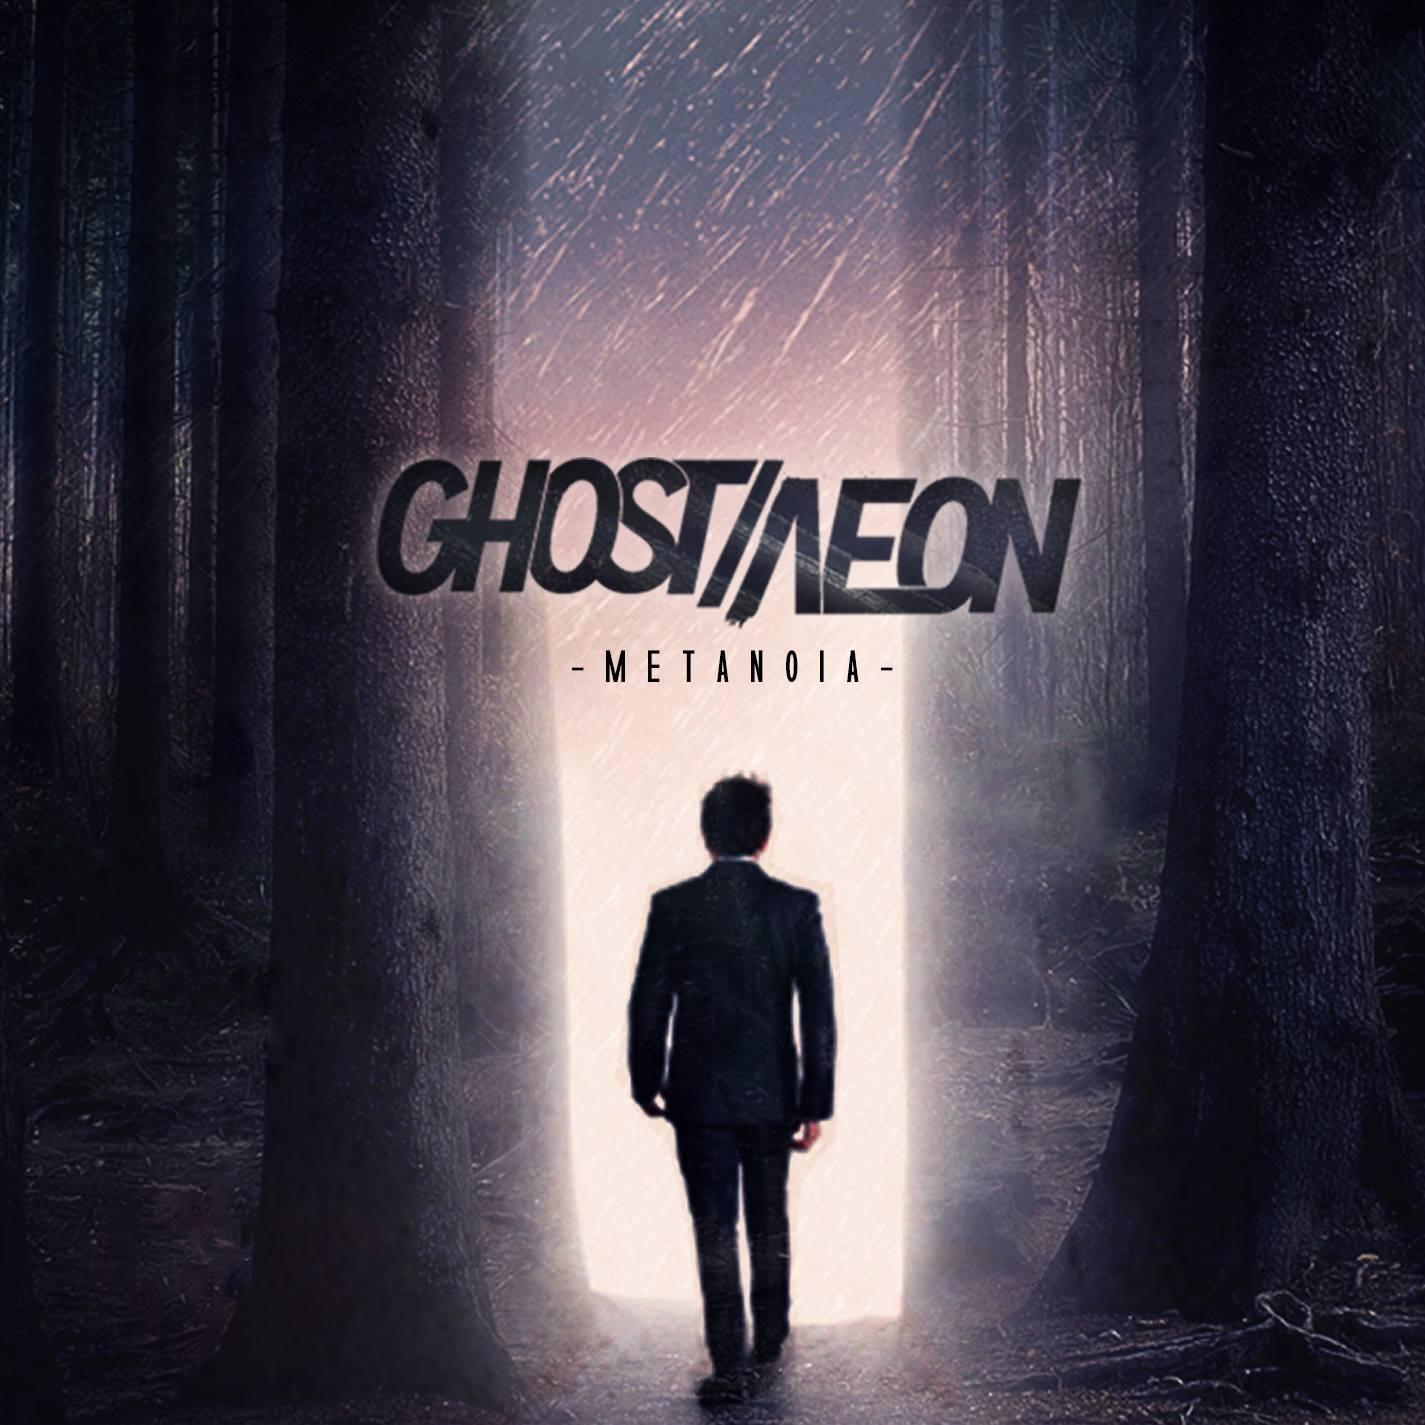 Ghost/Aeon - Diverge [Single] (2015)